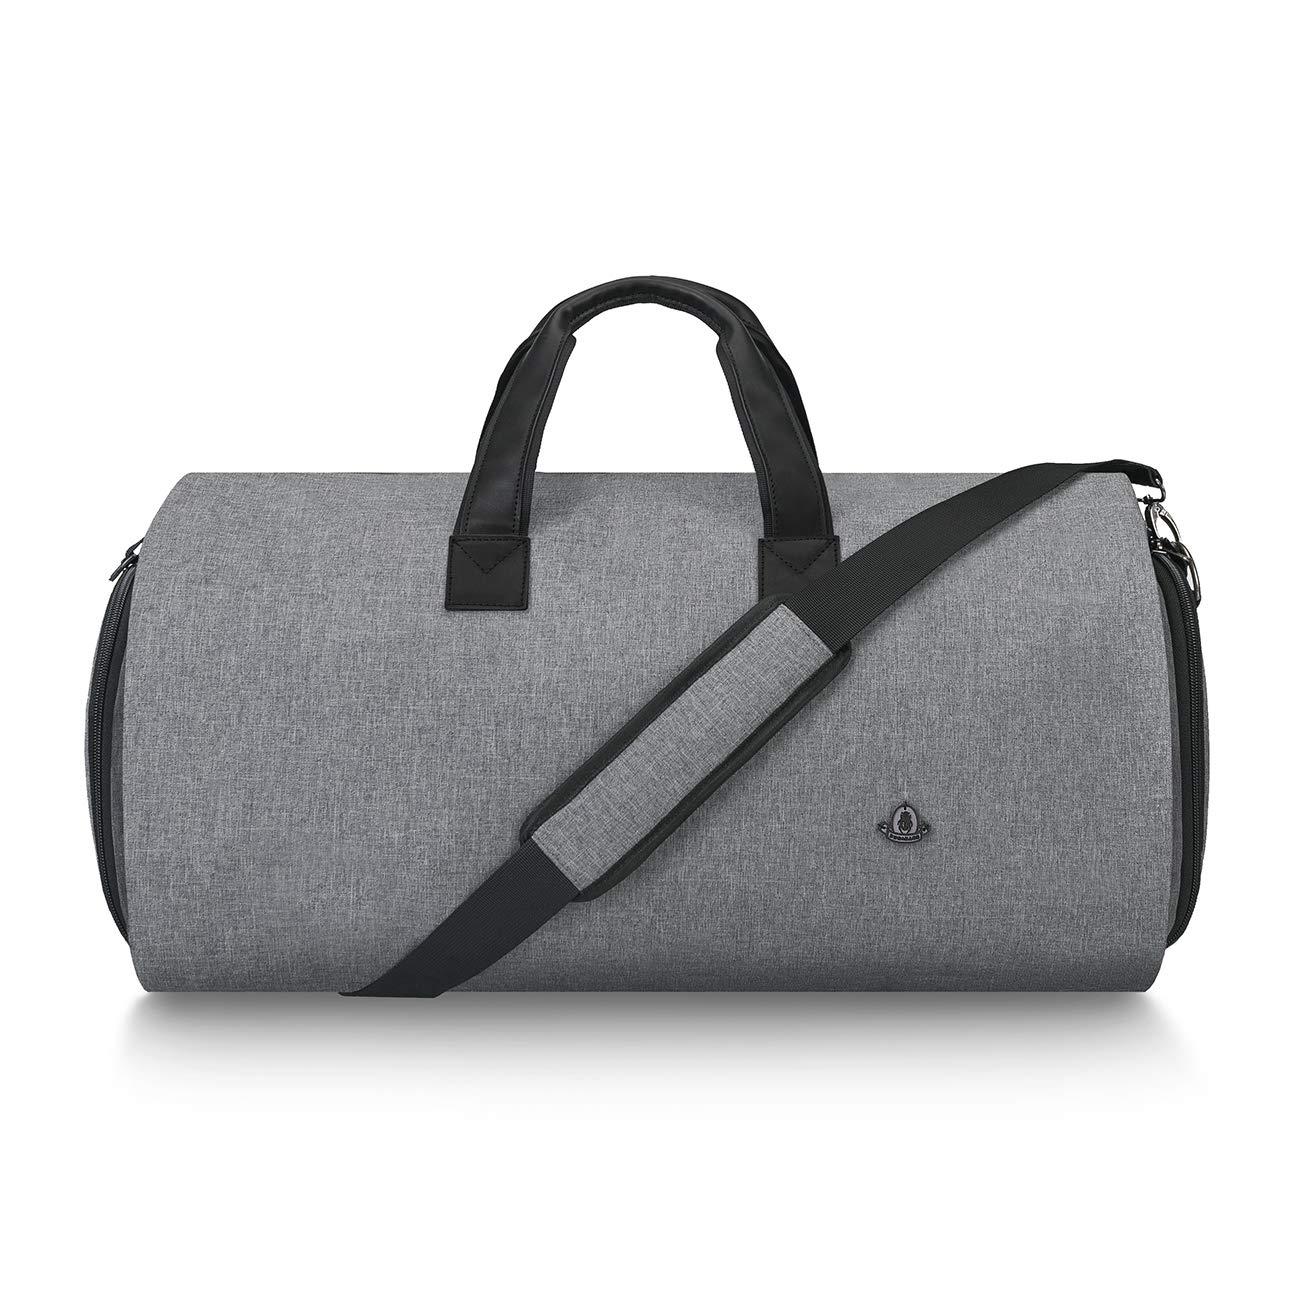 BUG Travel Garment Bag and Duffel,Convertible Garment Duffel Bag - 2 in 1 Suit Garment Bag,Dark Gray